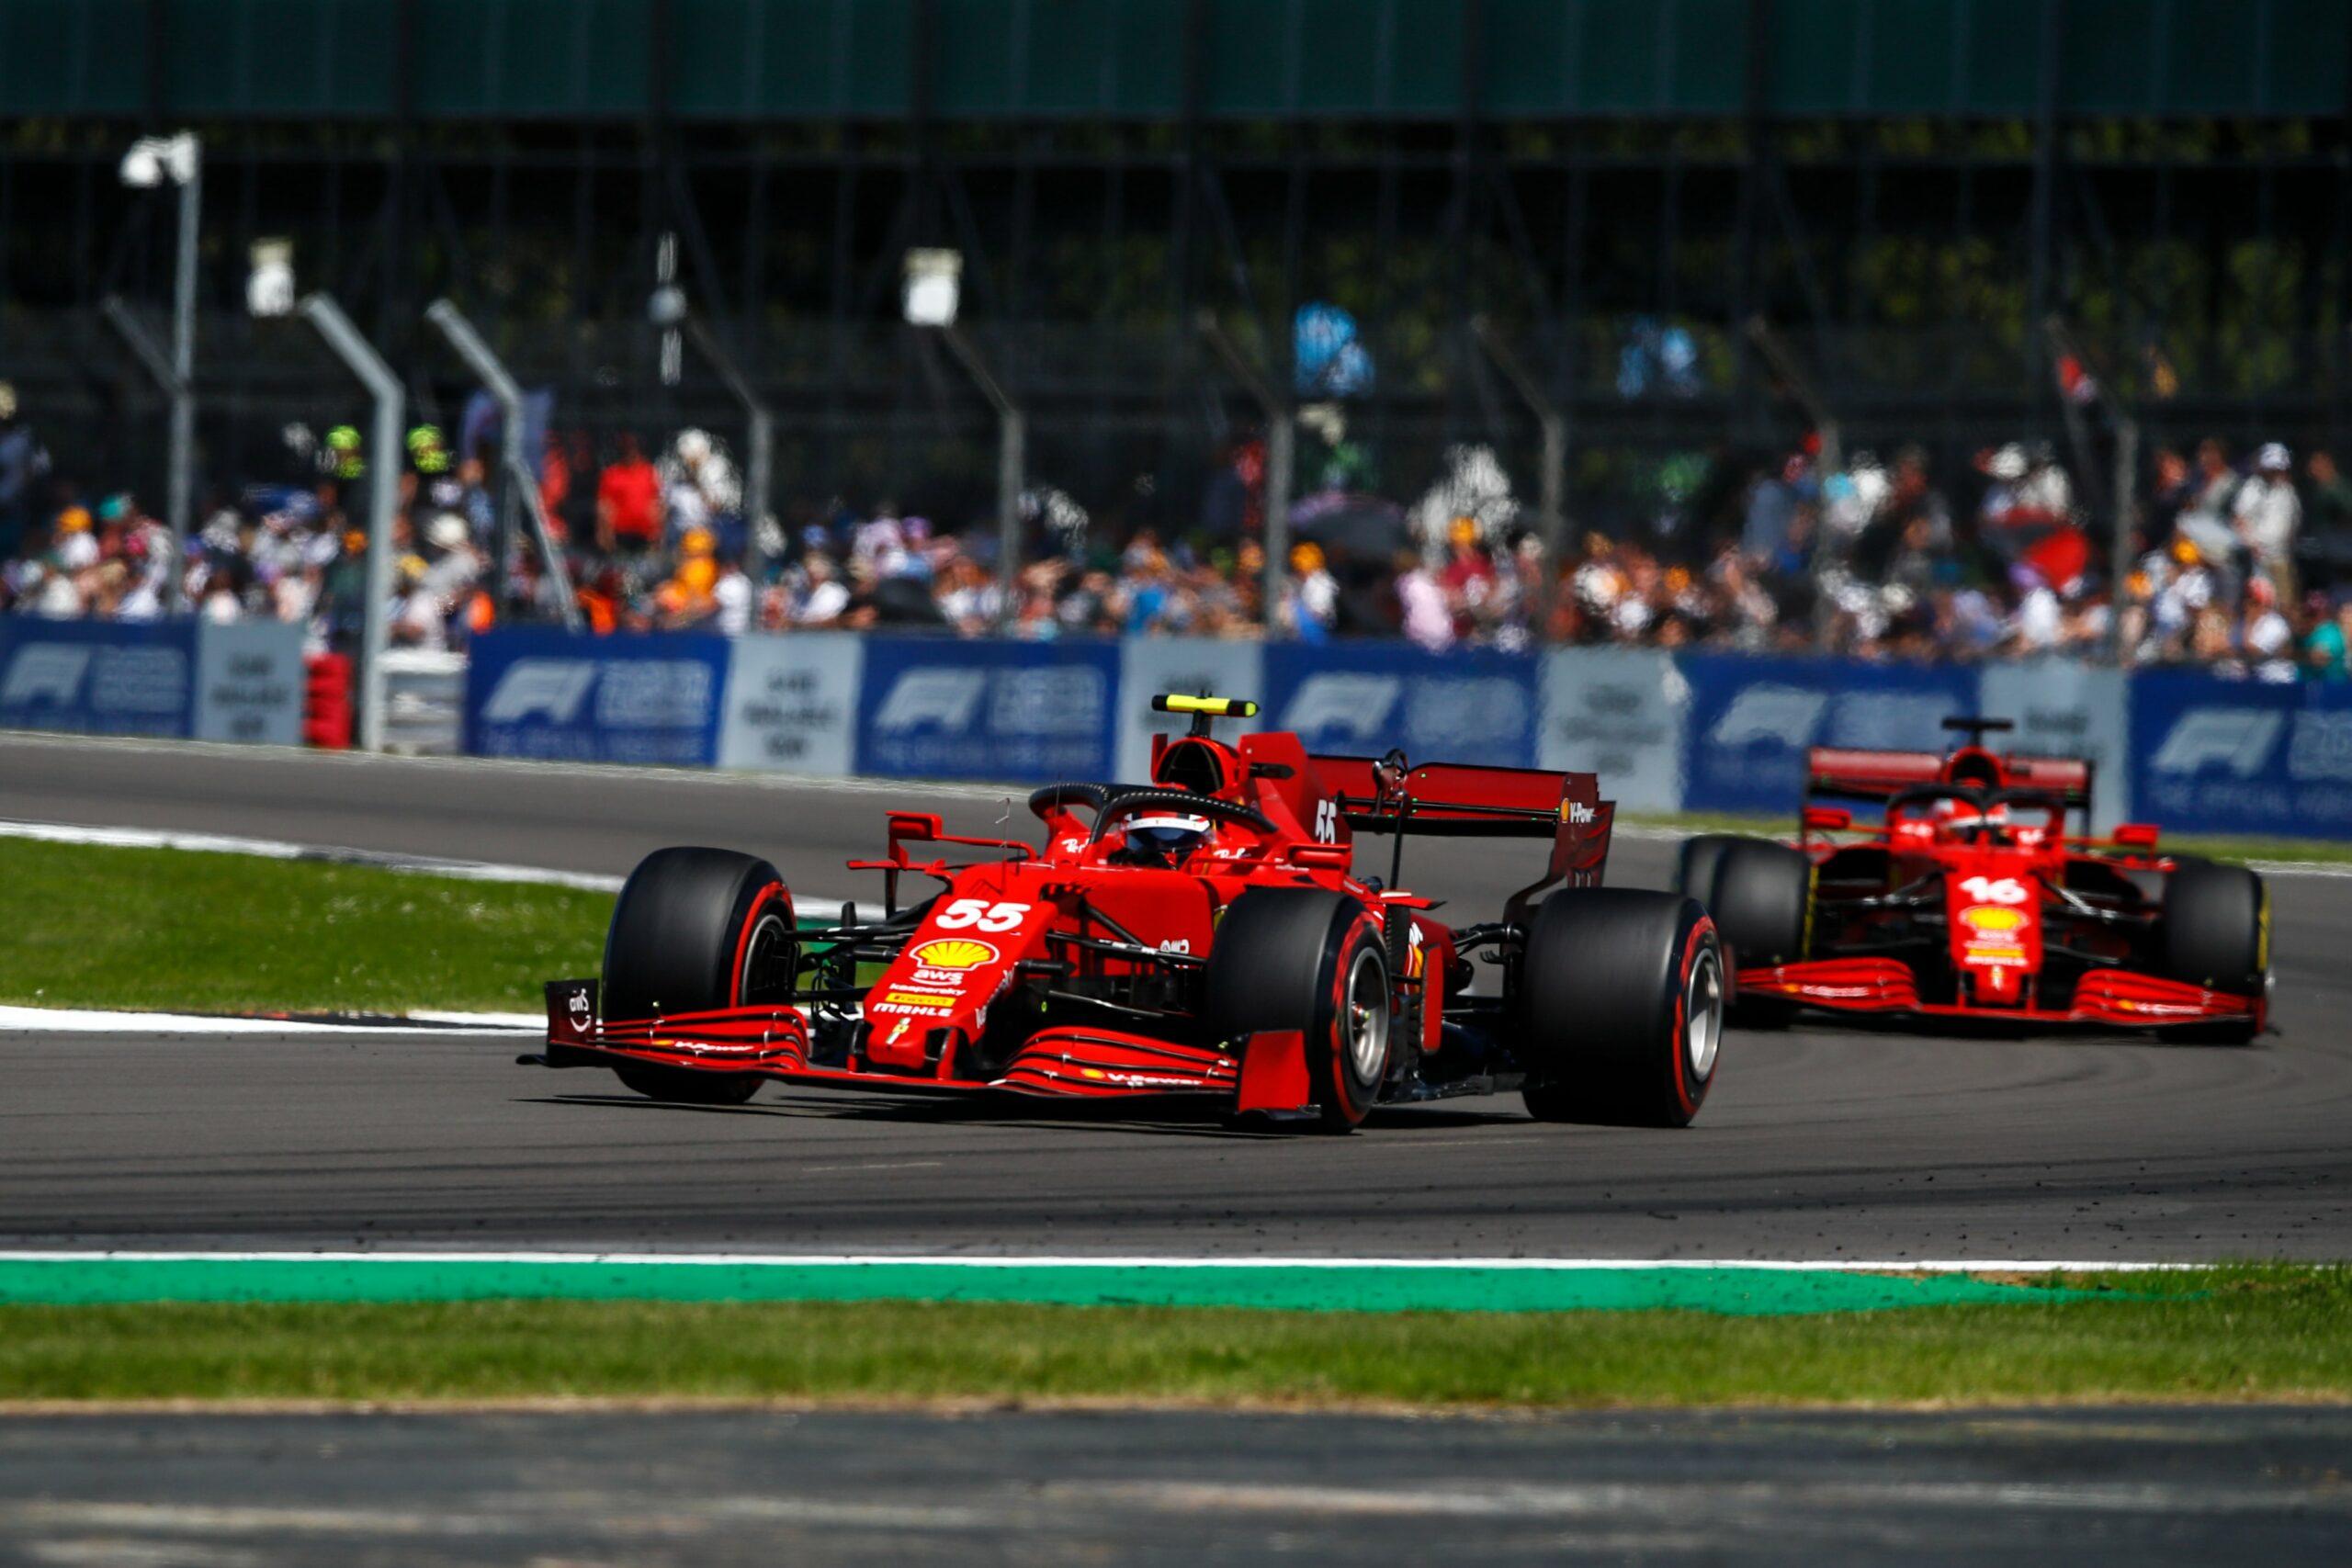 F1 - La F1 confirme 9 cas positifs Covid-19 au GP de Grande-Bretagne